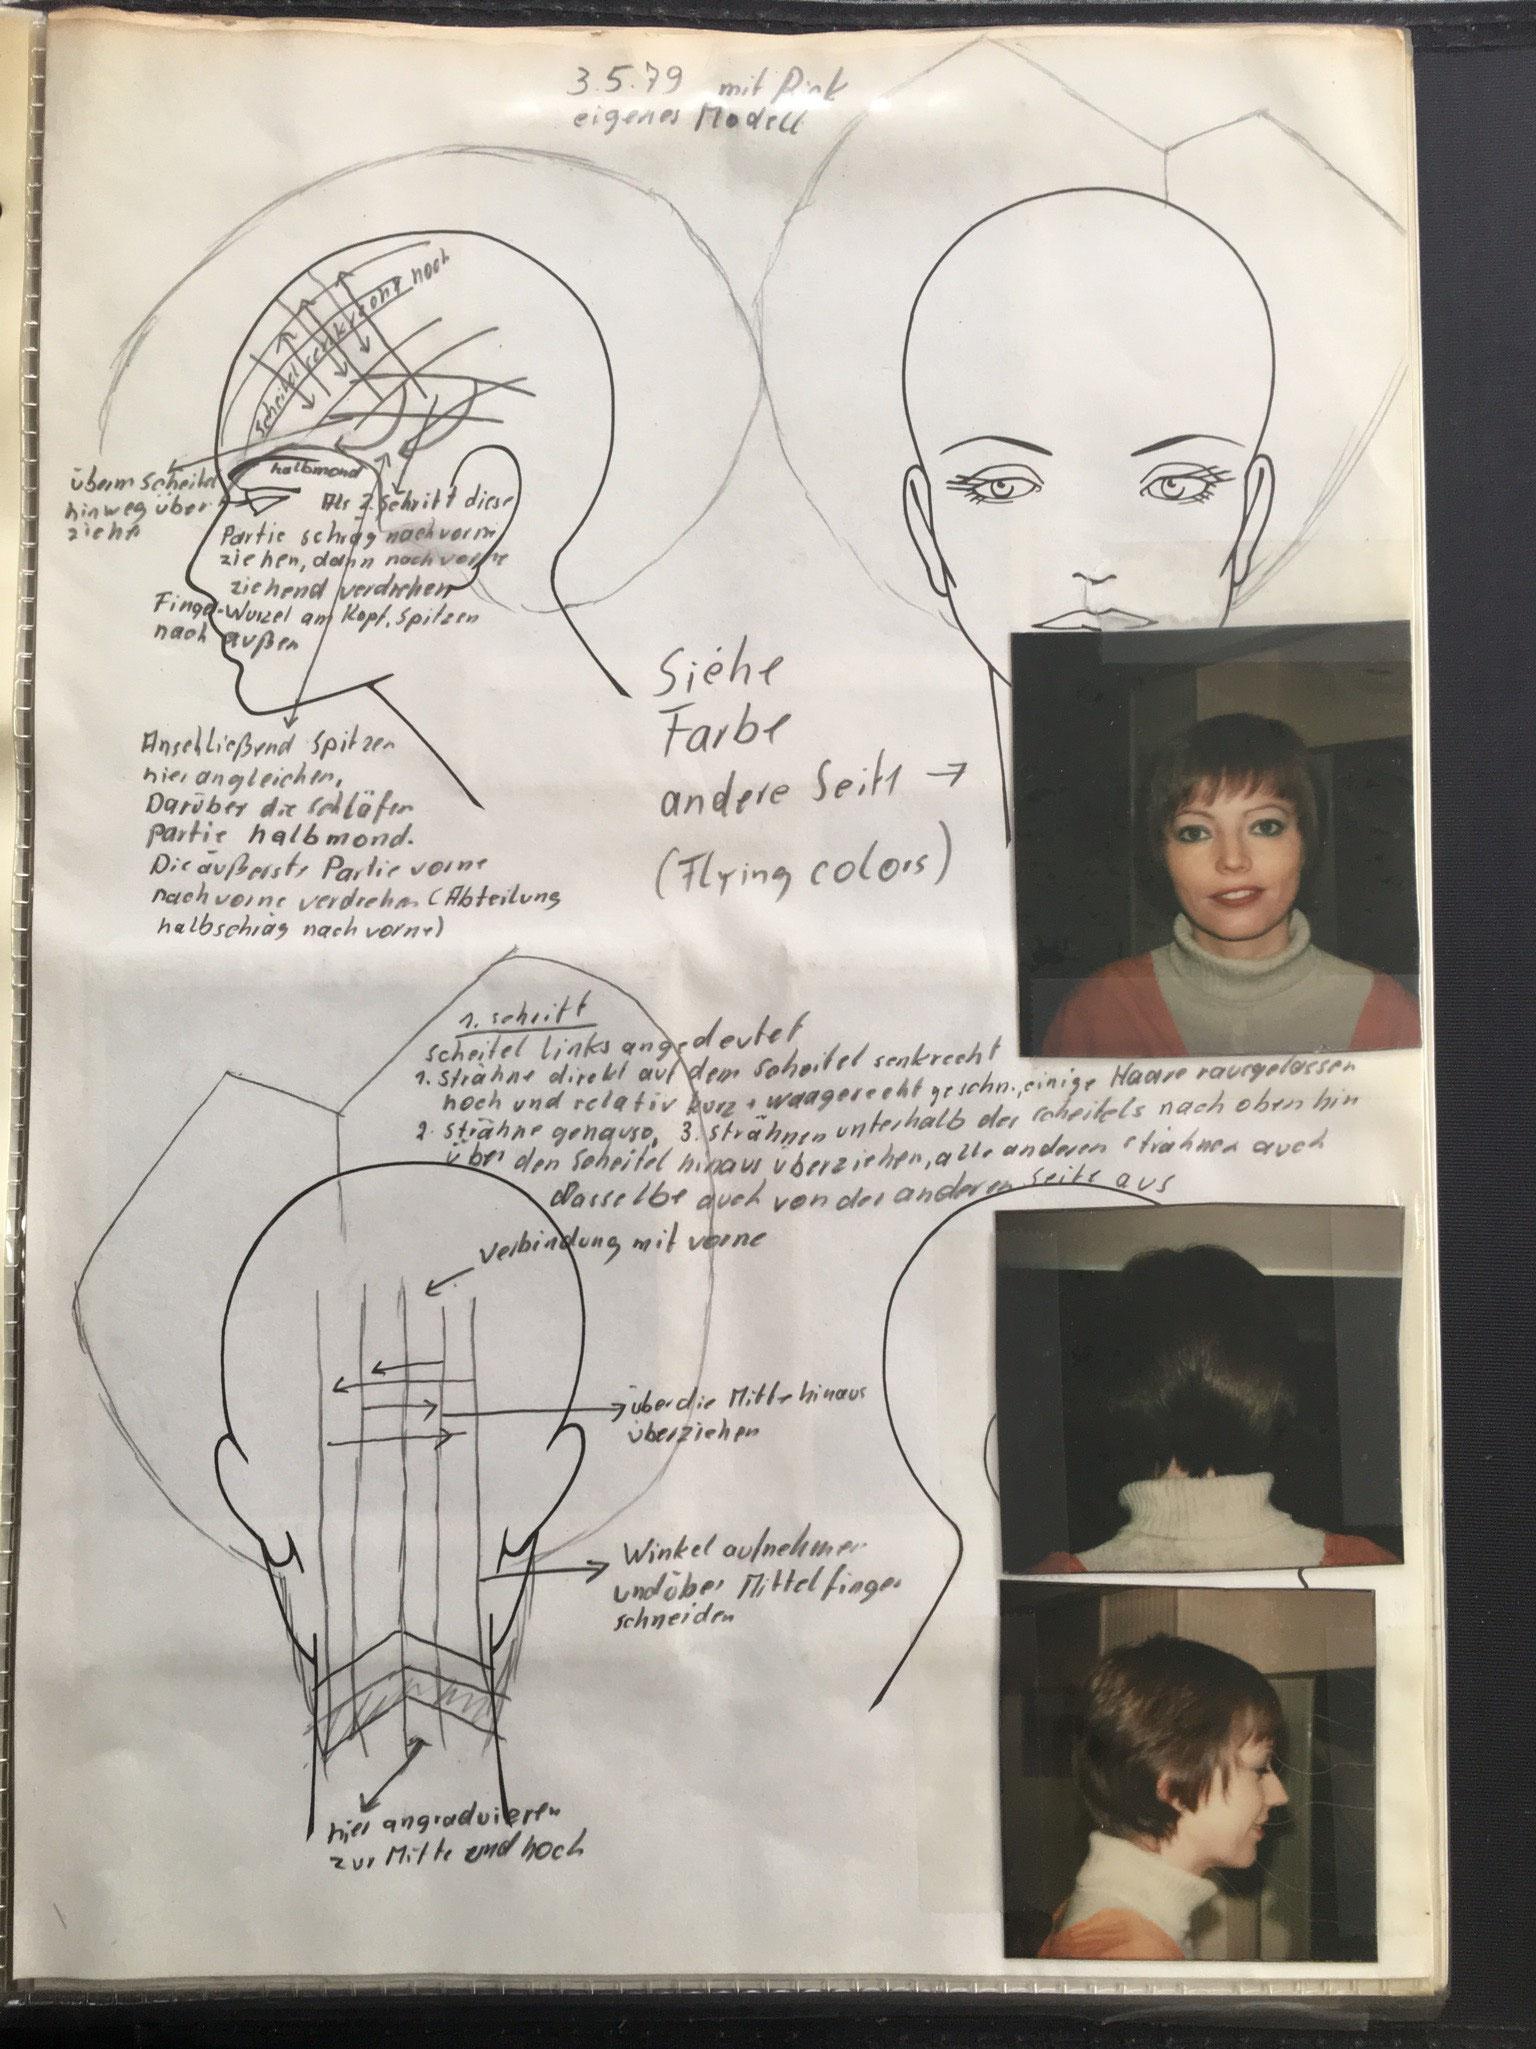 roger thompson hair icon bredtmann friseur in wuppertal. Black Bedroom Furniture Sets. Home Design Ideas